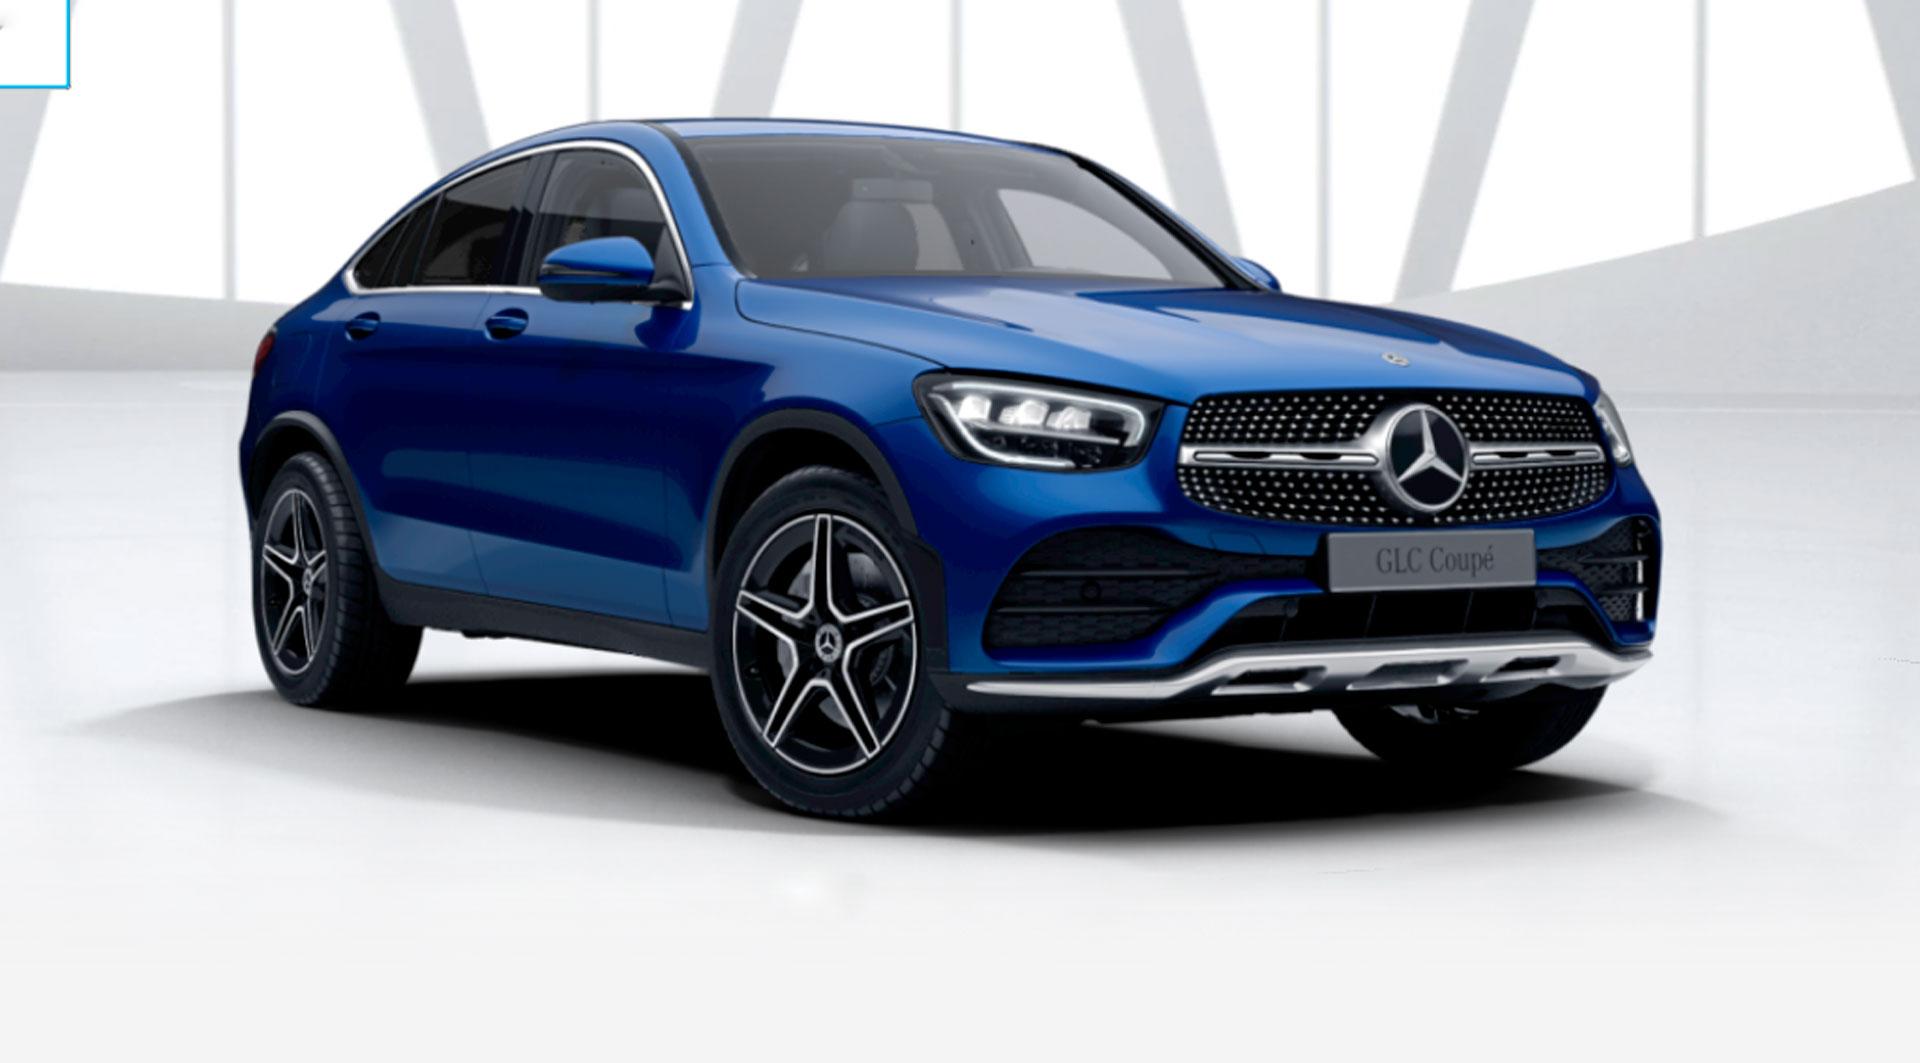 Mercedes-Benz GLC Coupe  0152630051